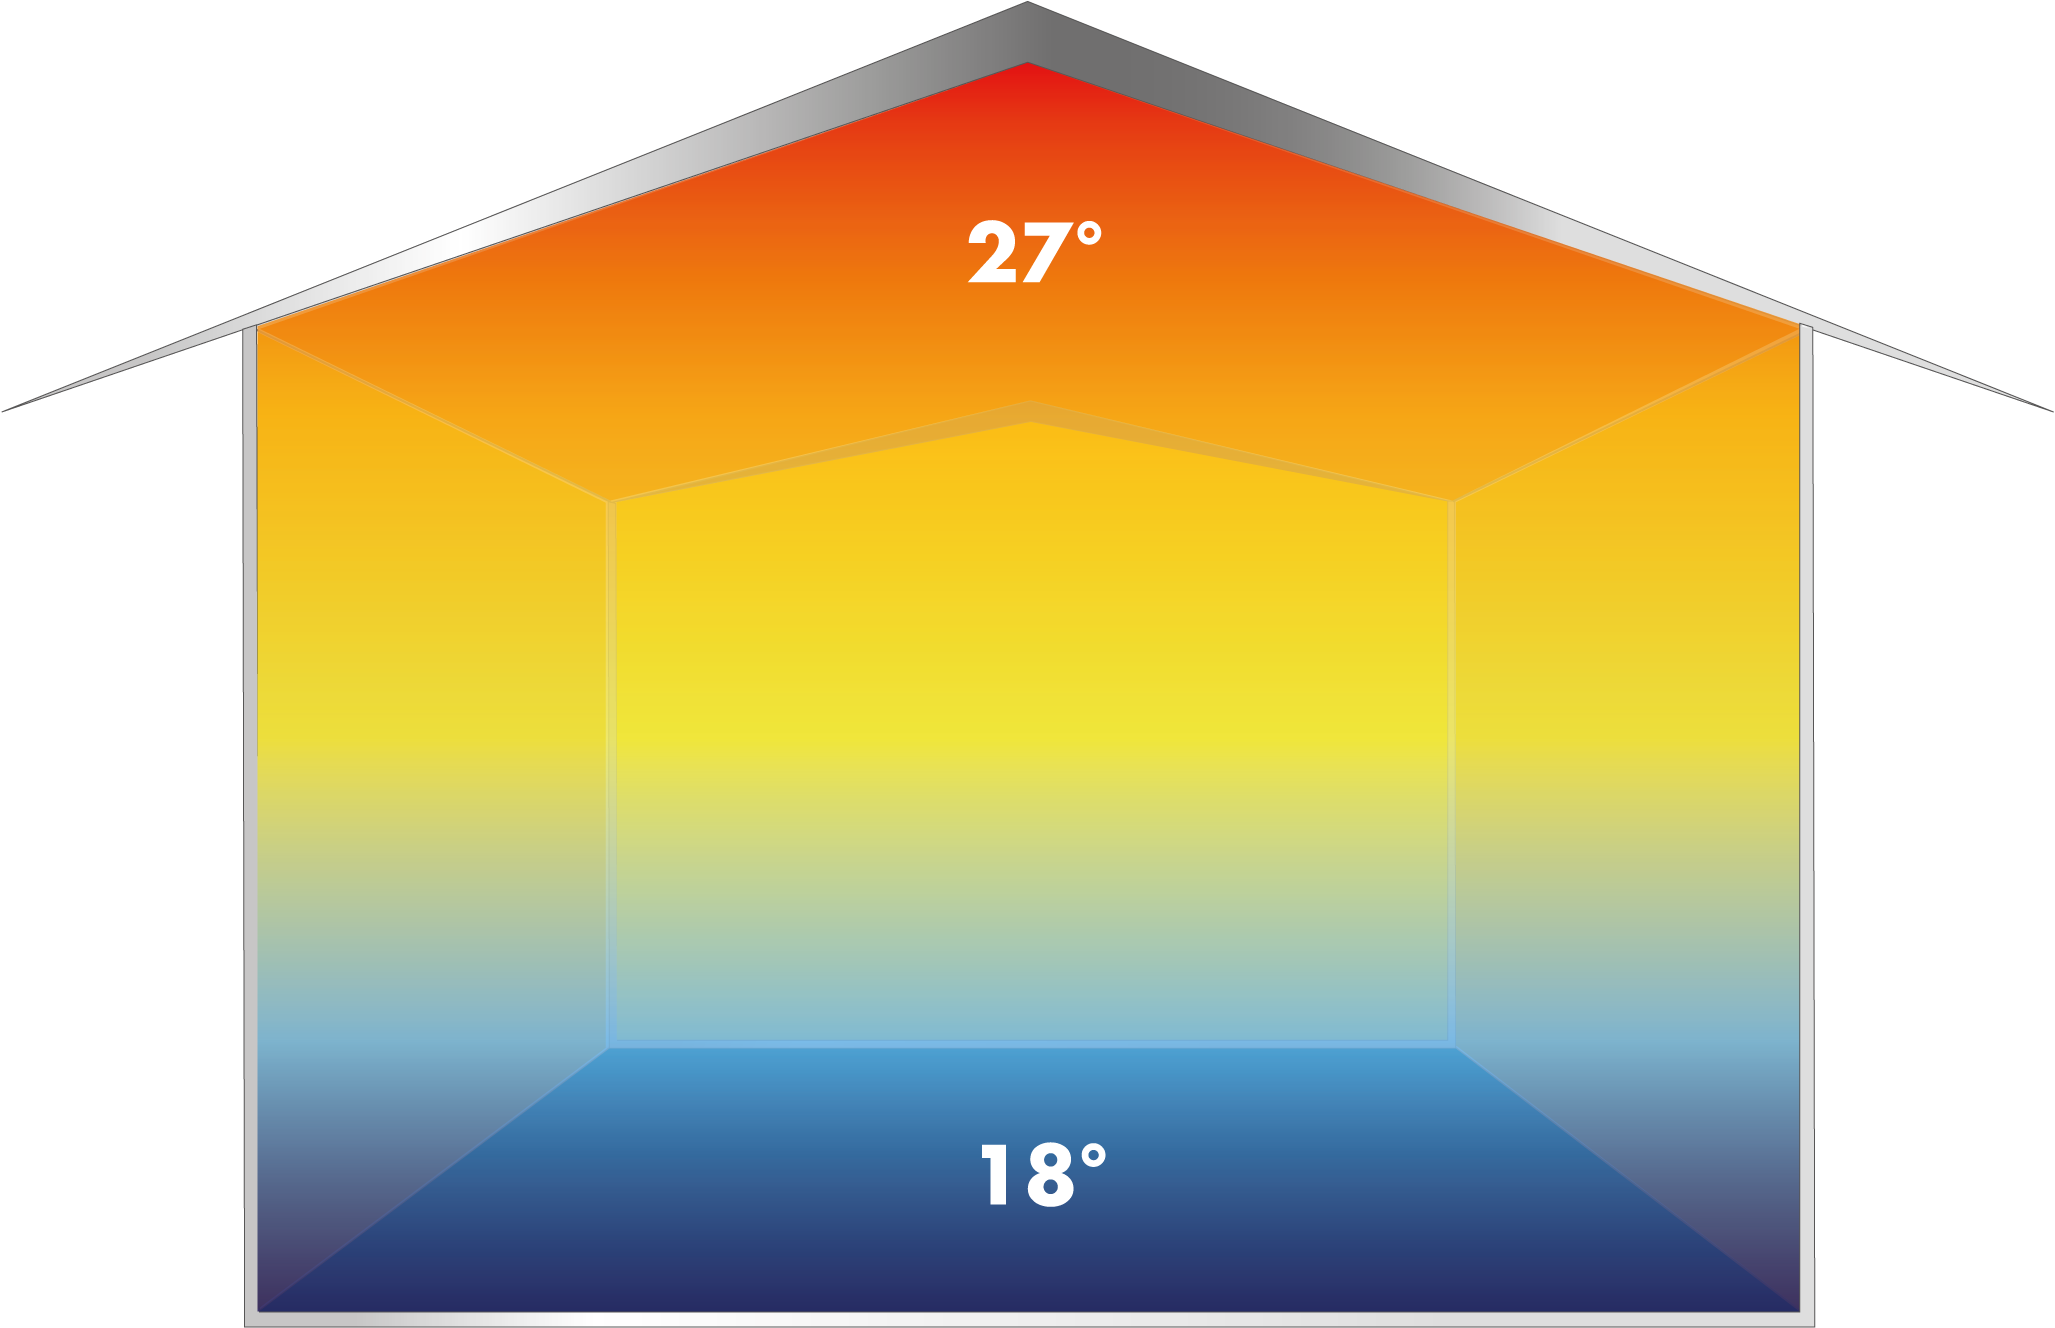 https://www.airius.solutions/wp-content/uploads/maison-sans-airius-temperature-640x414.png